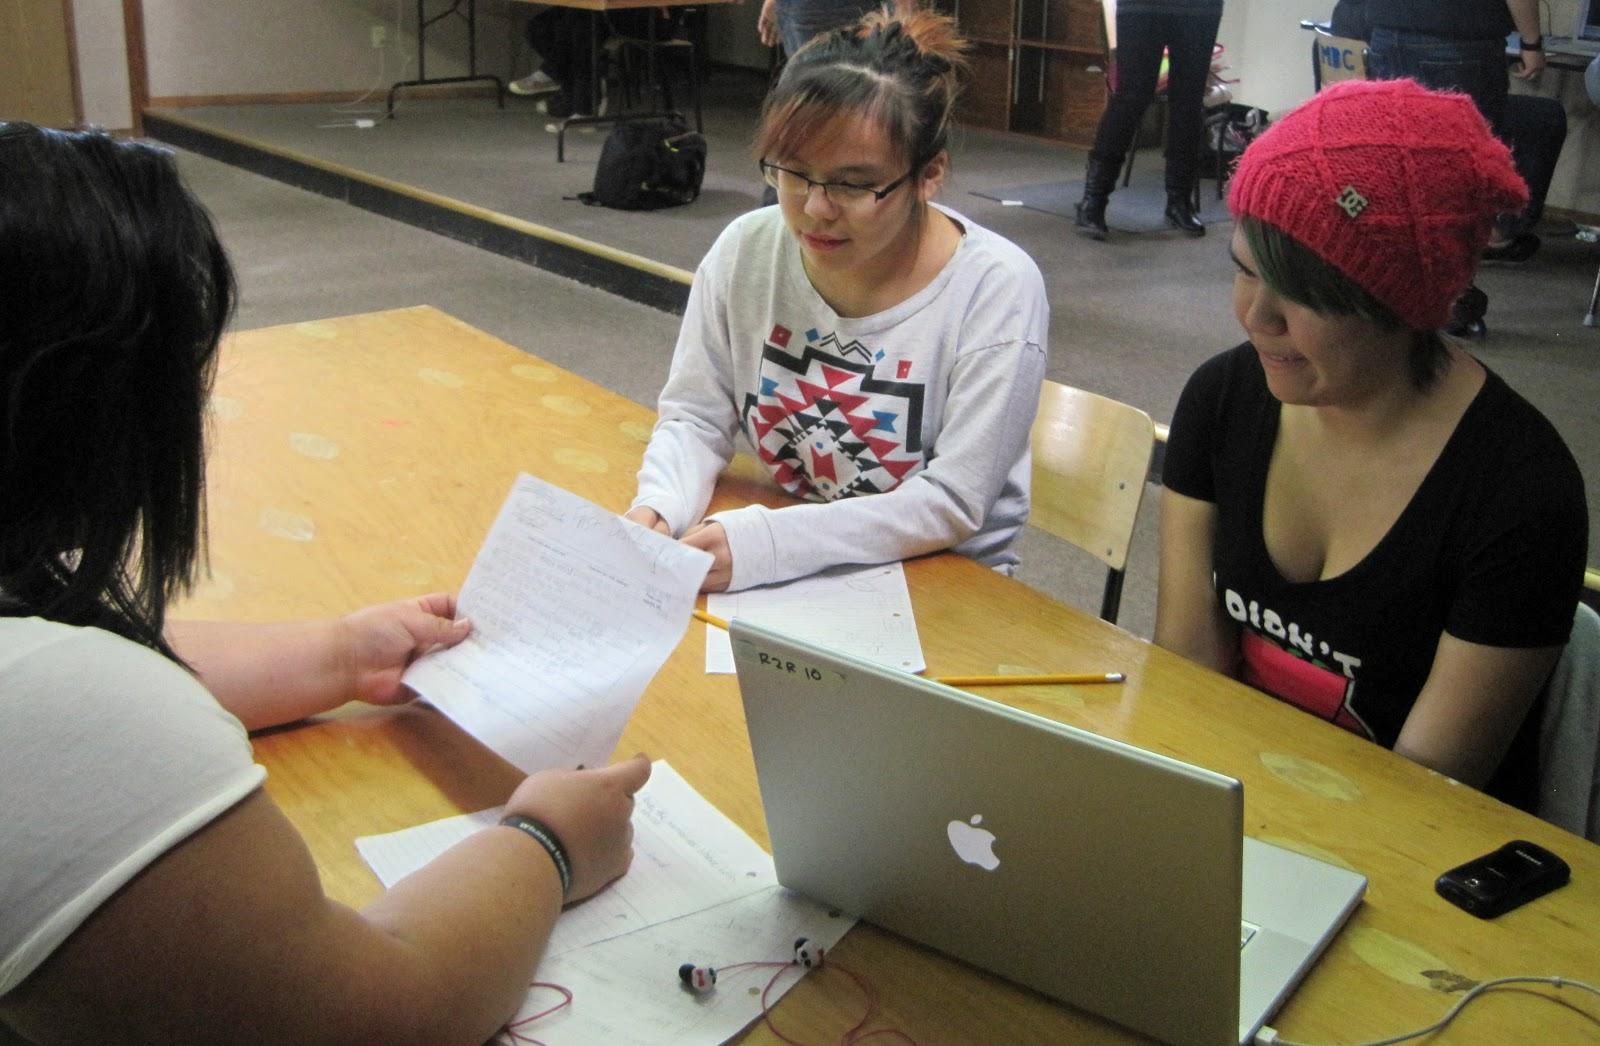 Kendra, Danielle and Jordyn work on their story.